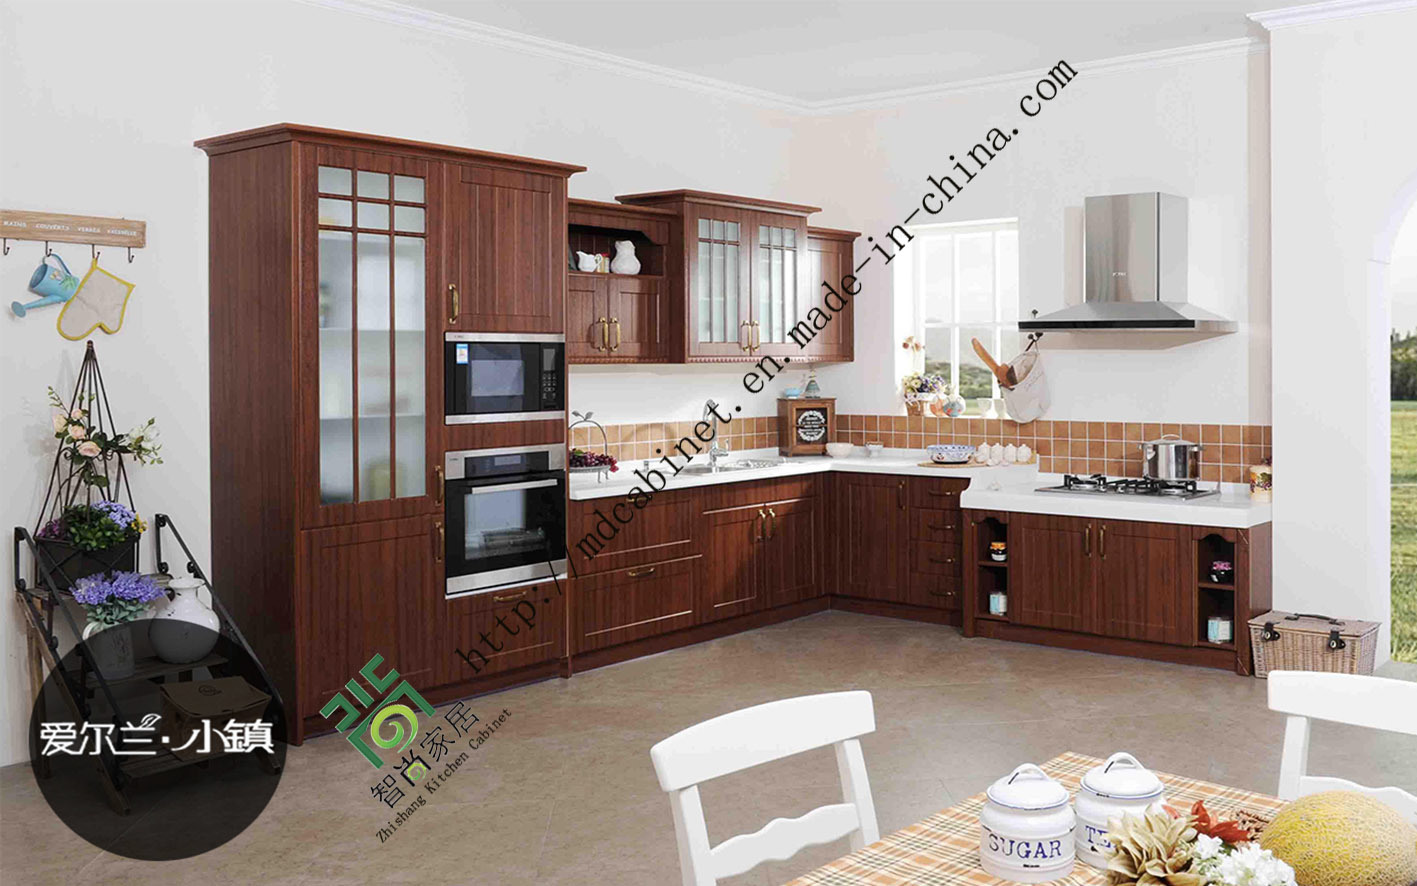 2015 de PVC modernos gabinetes de cocina con muebles de diseño están ajustadas (ZS-239)